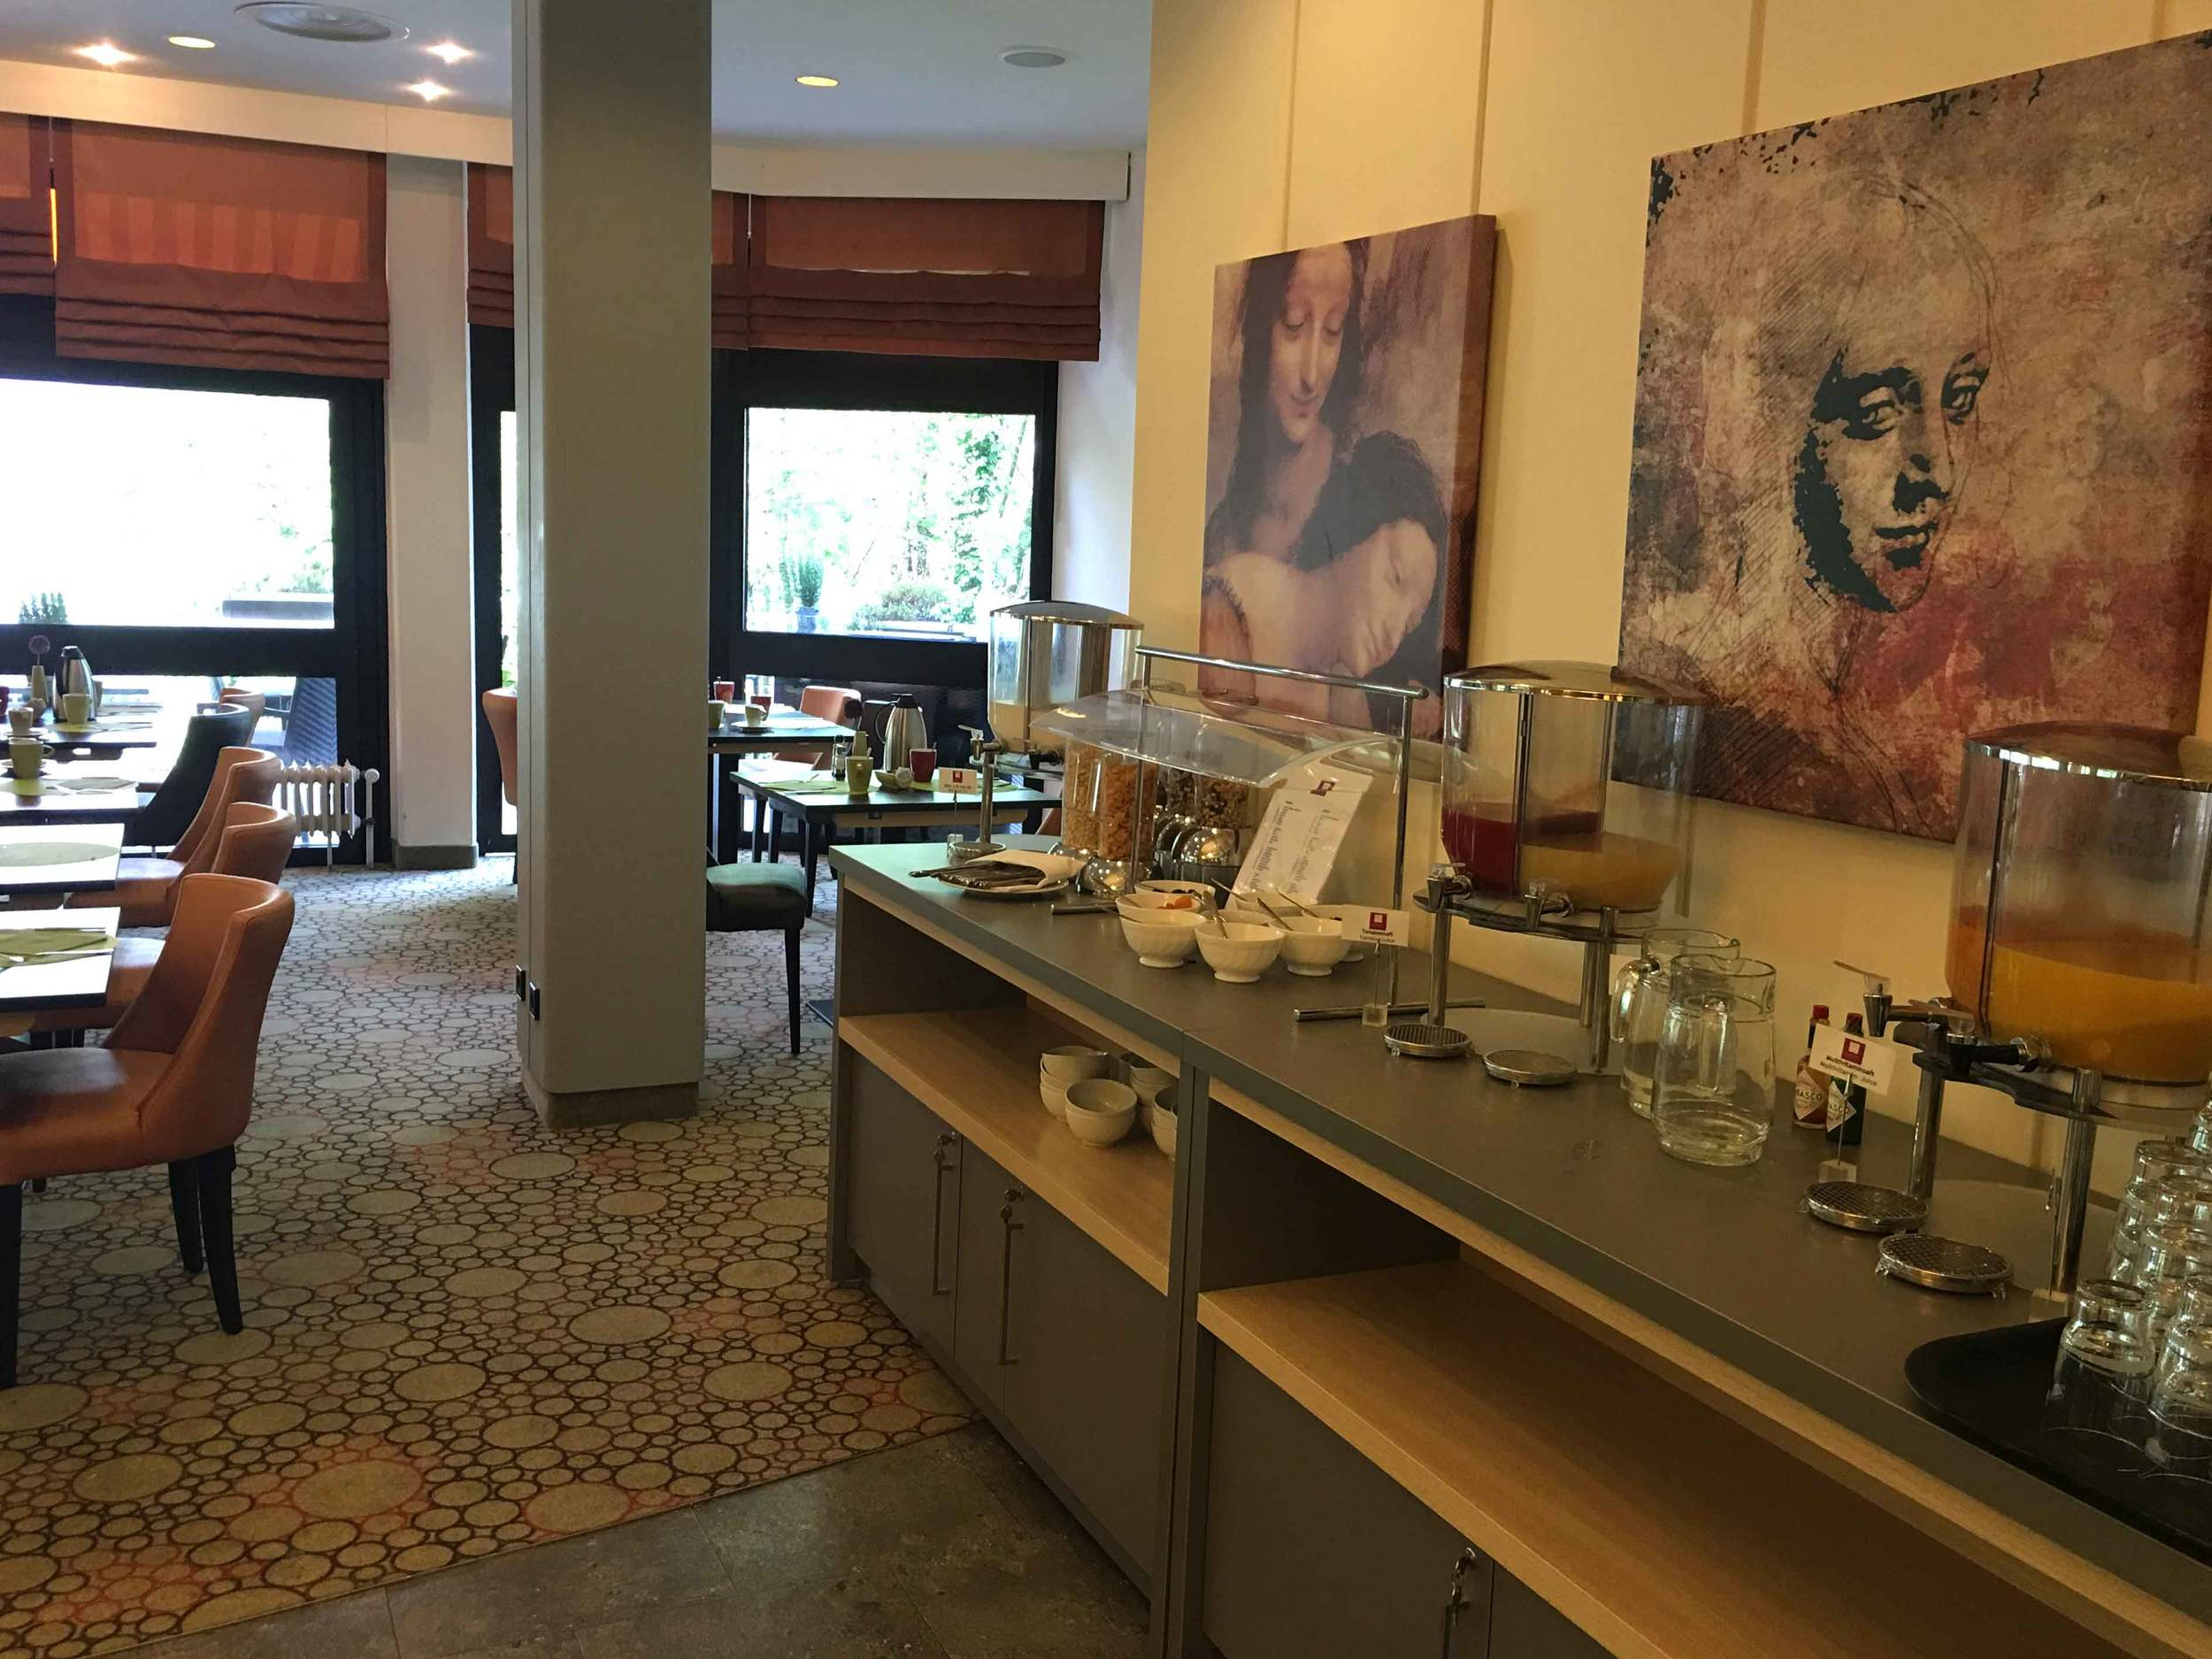 Buffet breakfast room, Leonardo Royal hotel, Baden Baden, Germany. Image©sourcingstyle.com